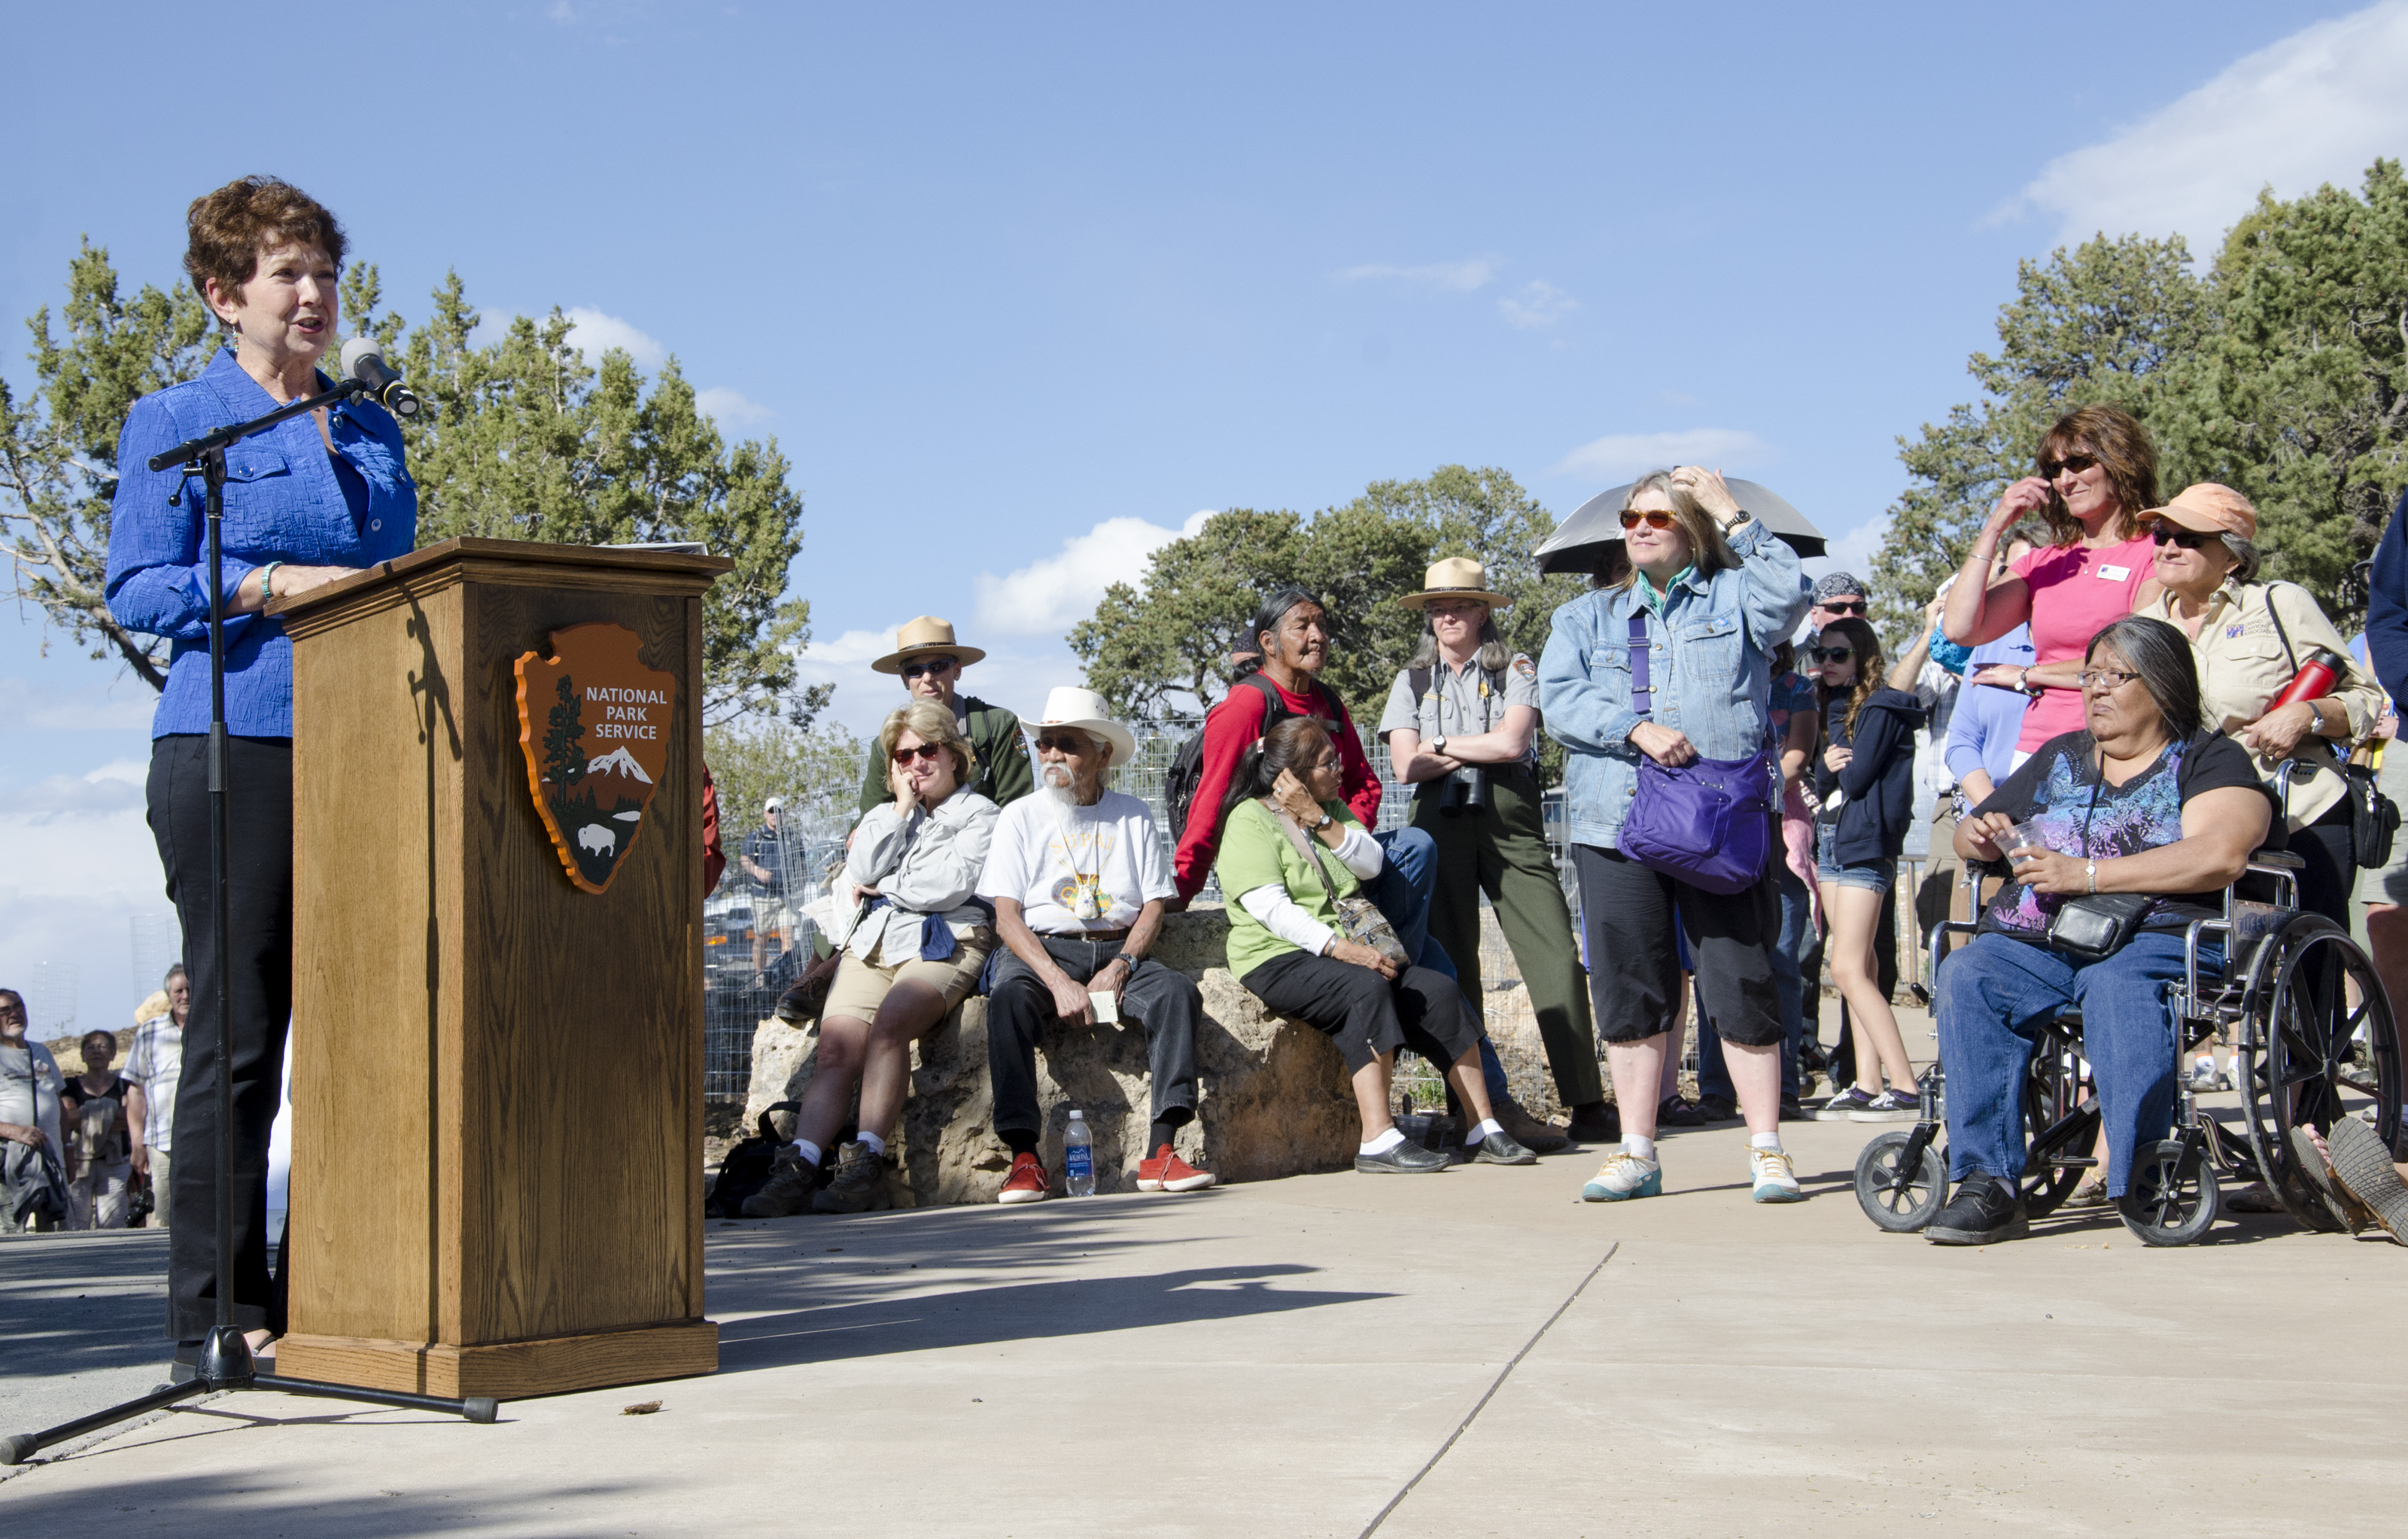 Bright Angel Trailhead Renovation Dedication - Chris Muldoon - May 18, 2013 - 224 - Flickr - Grand Canyon NPS.jpg During the dedication ceremony